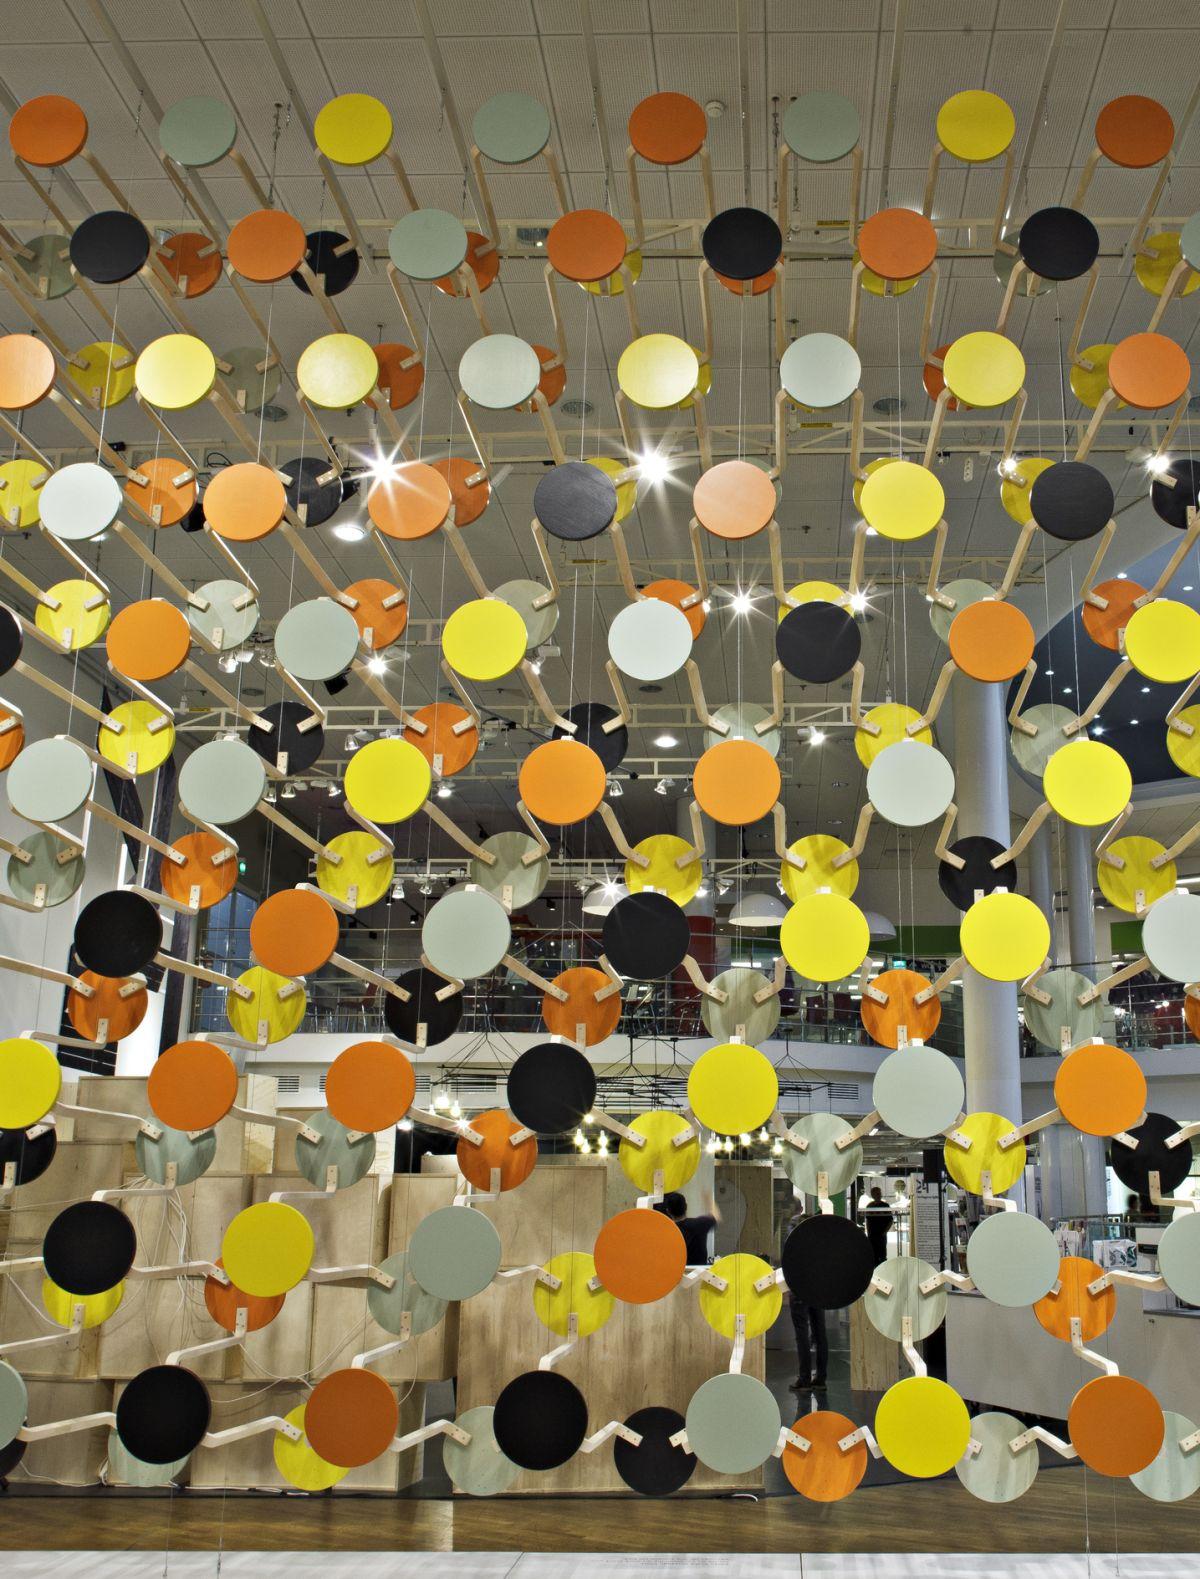 Artek_installation_Stool_60_Composition_by_Gronlund_Nisunen_photo_Rauno_Traskelin_front